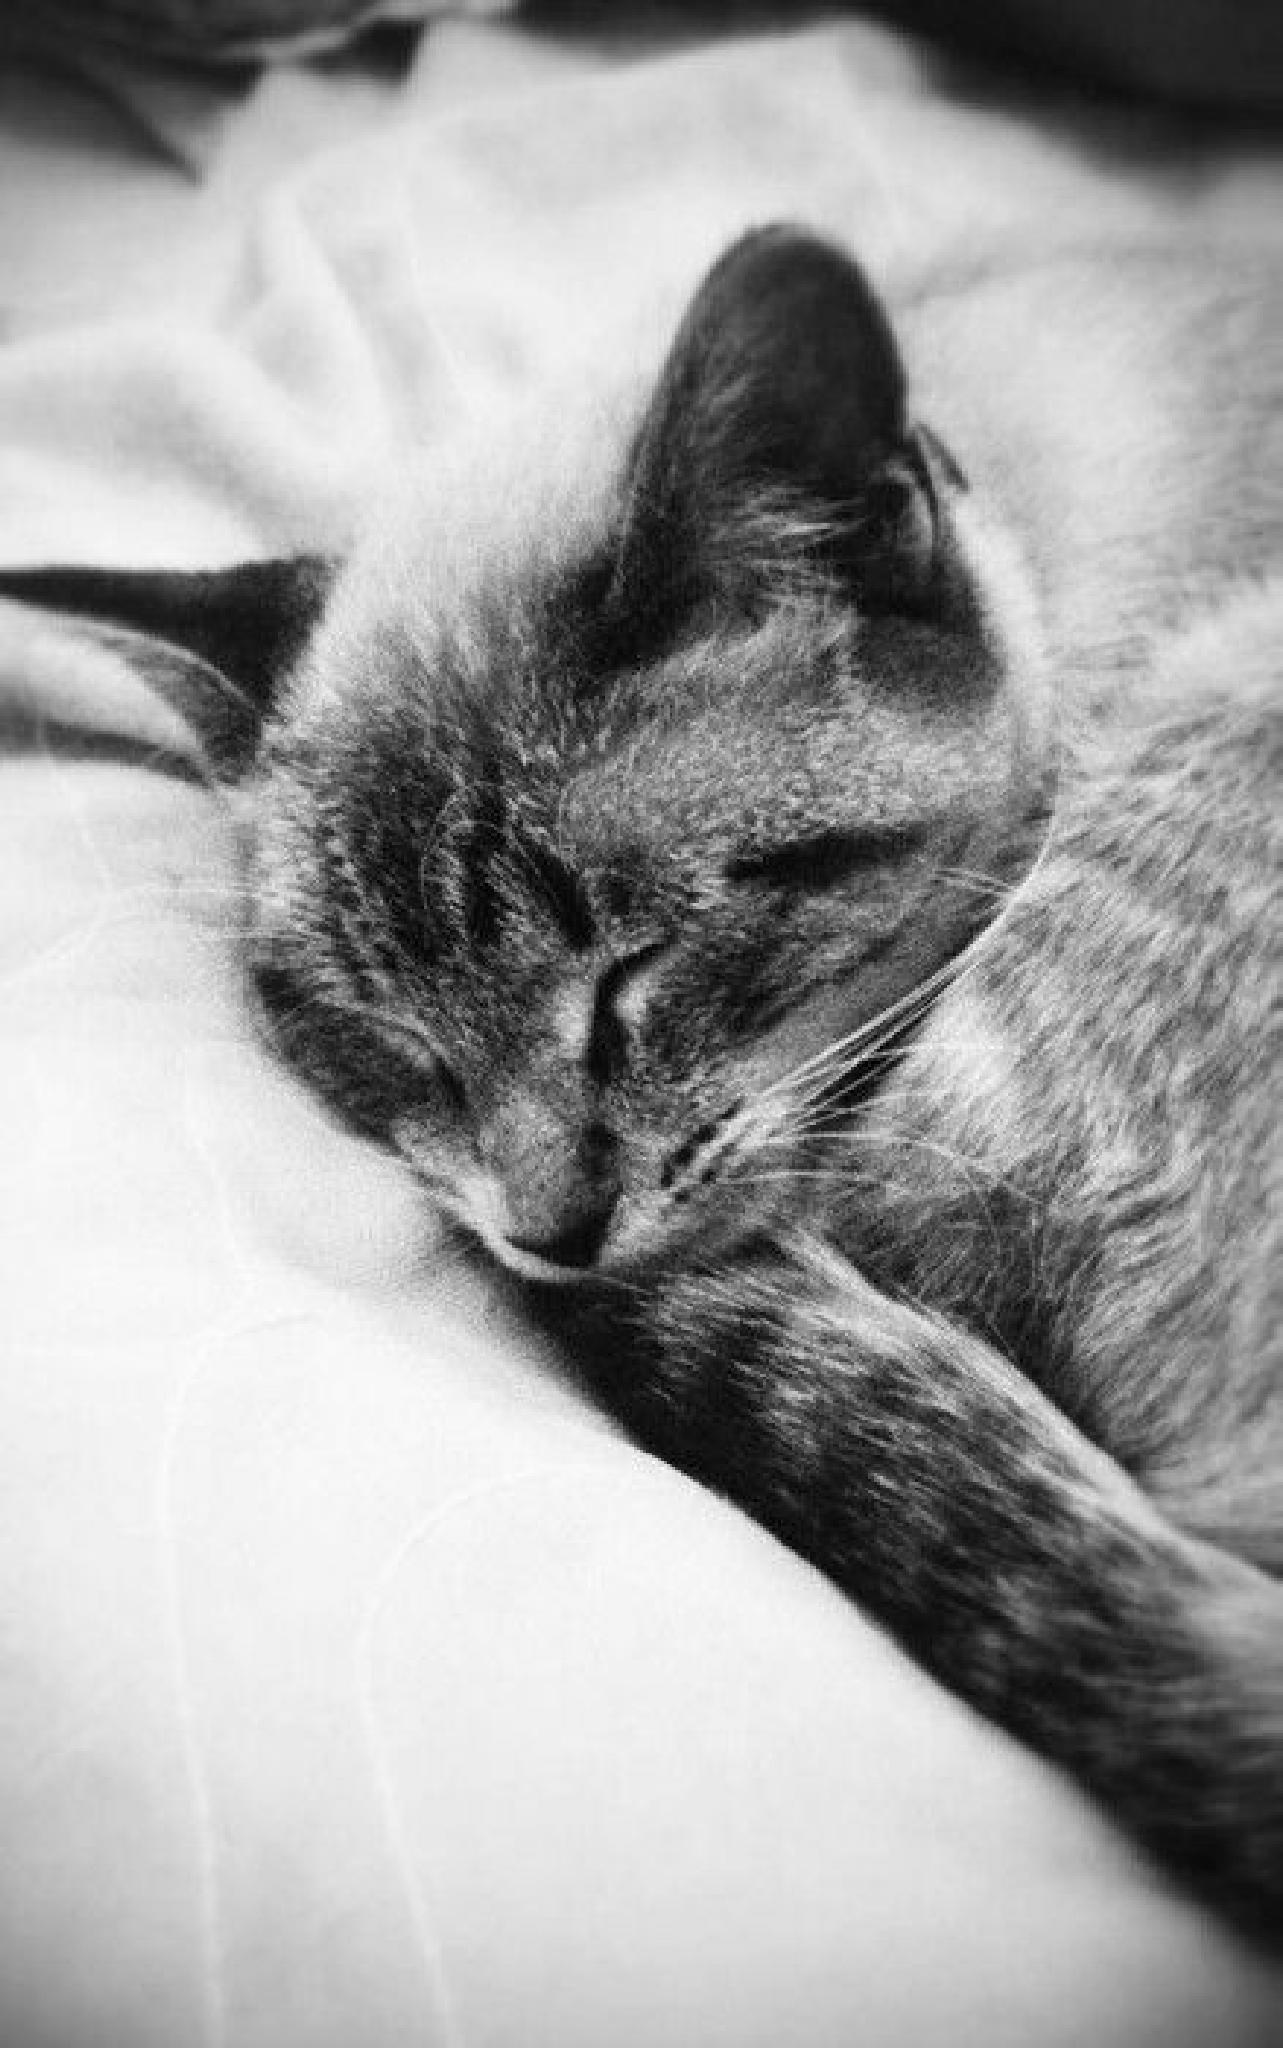 Sleepy Kitty by Ben Indie